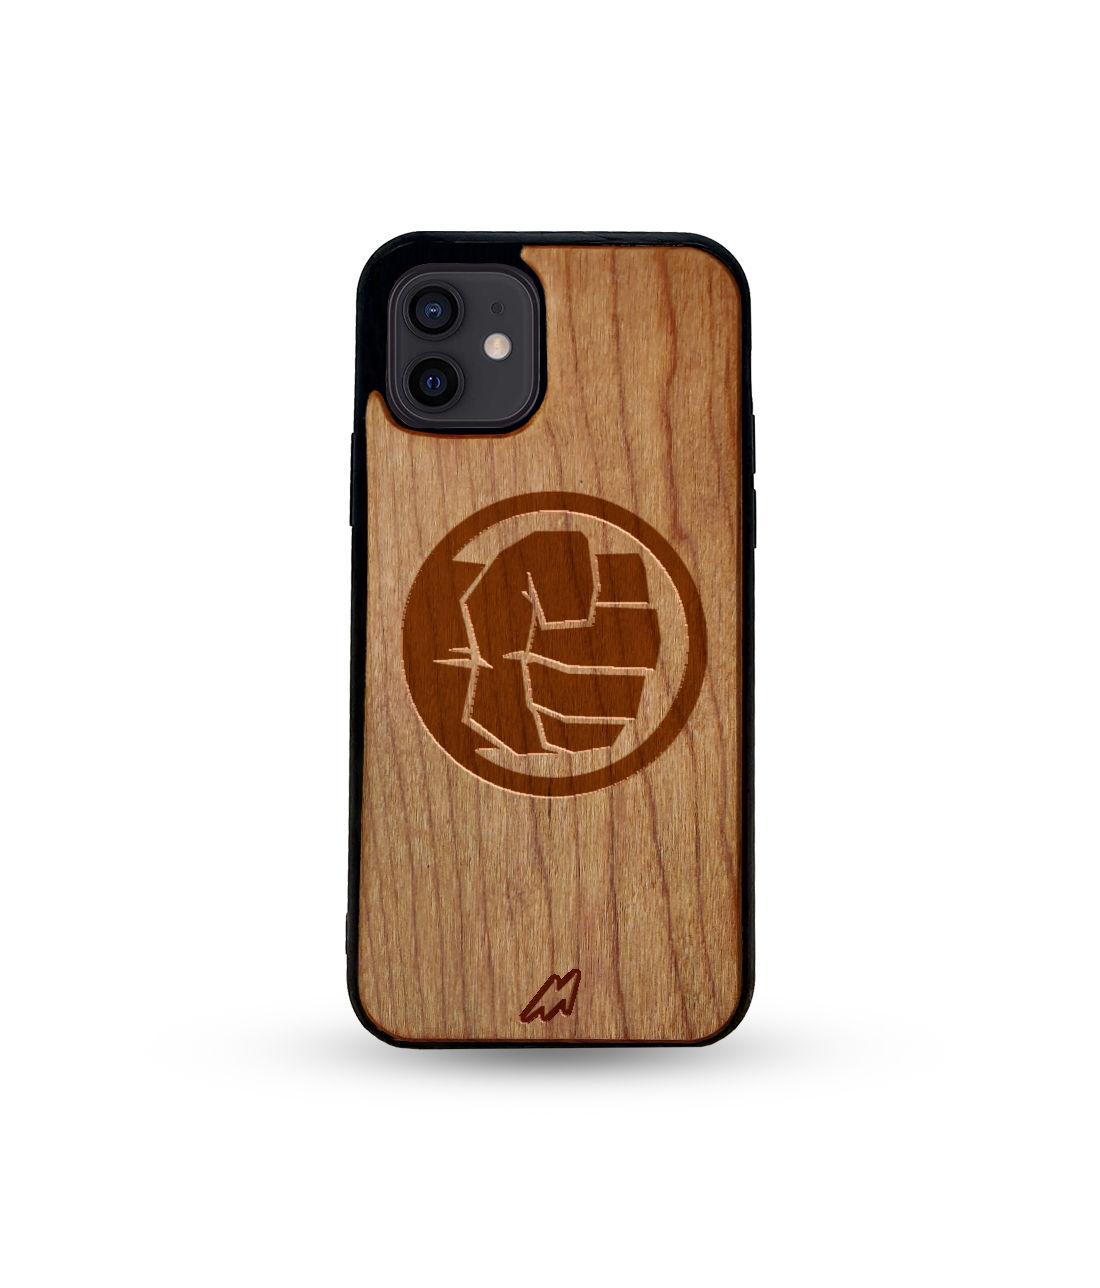 Hulk Smash - Honey Maple Wooden Phone Case for iPhone 12